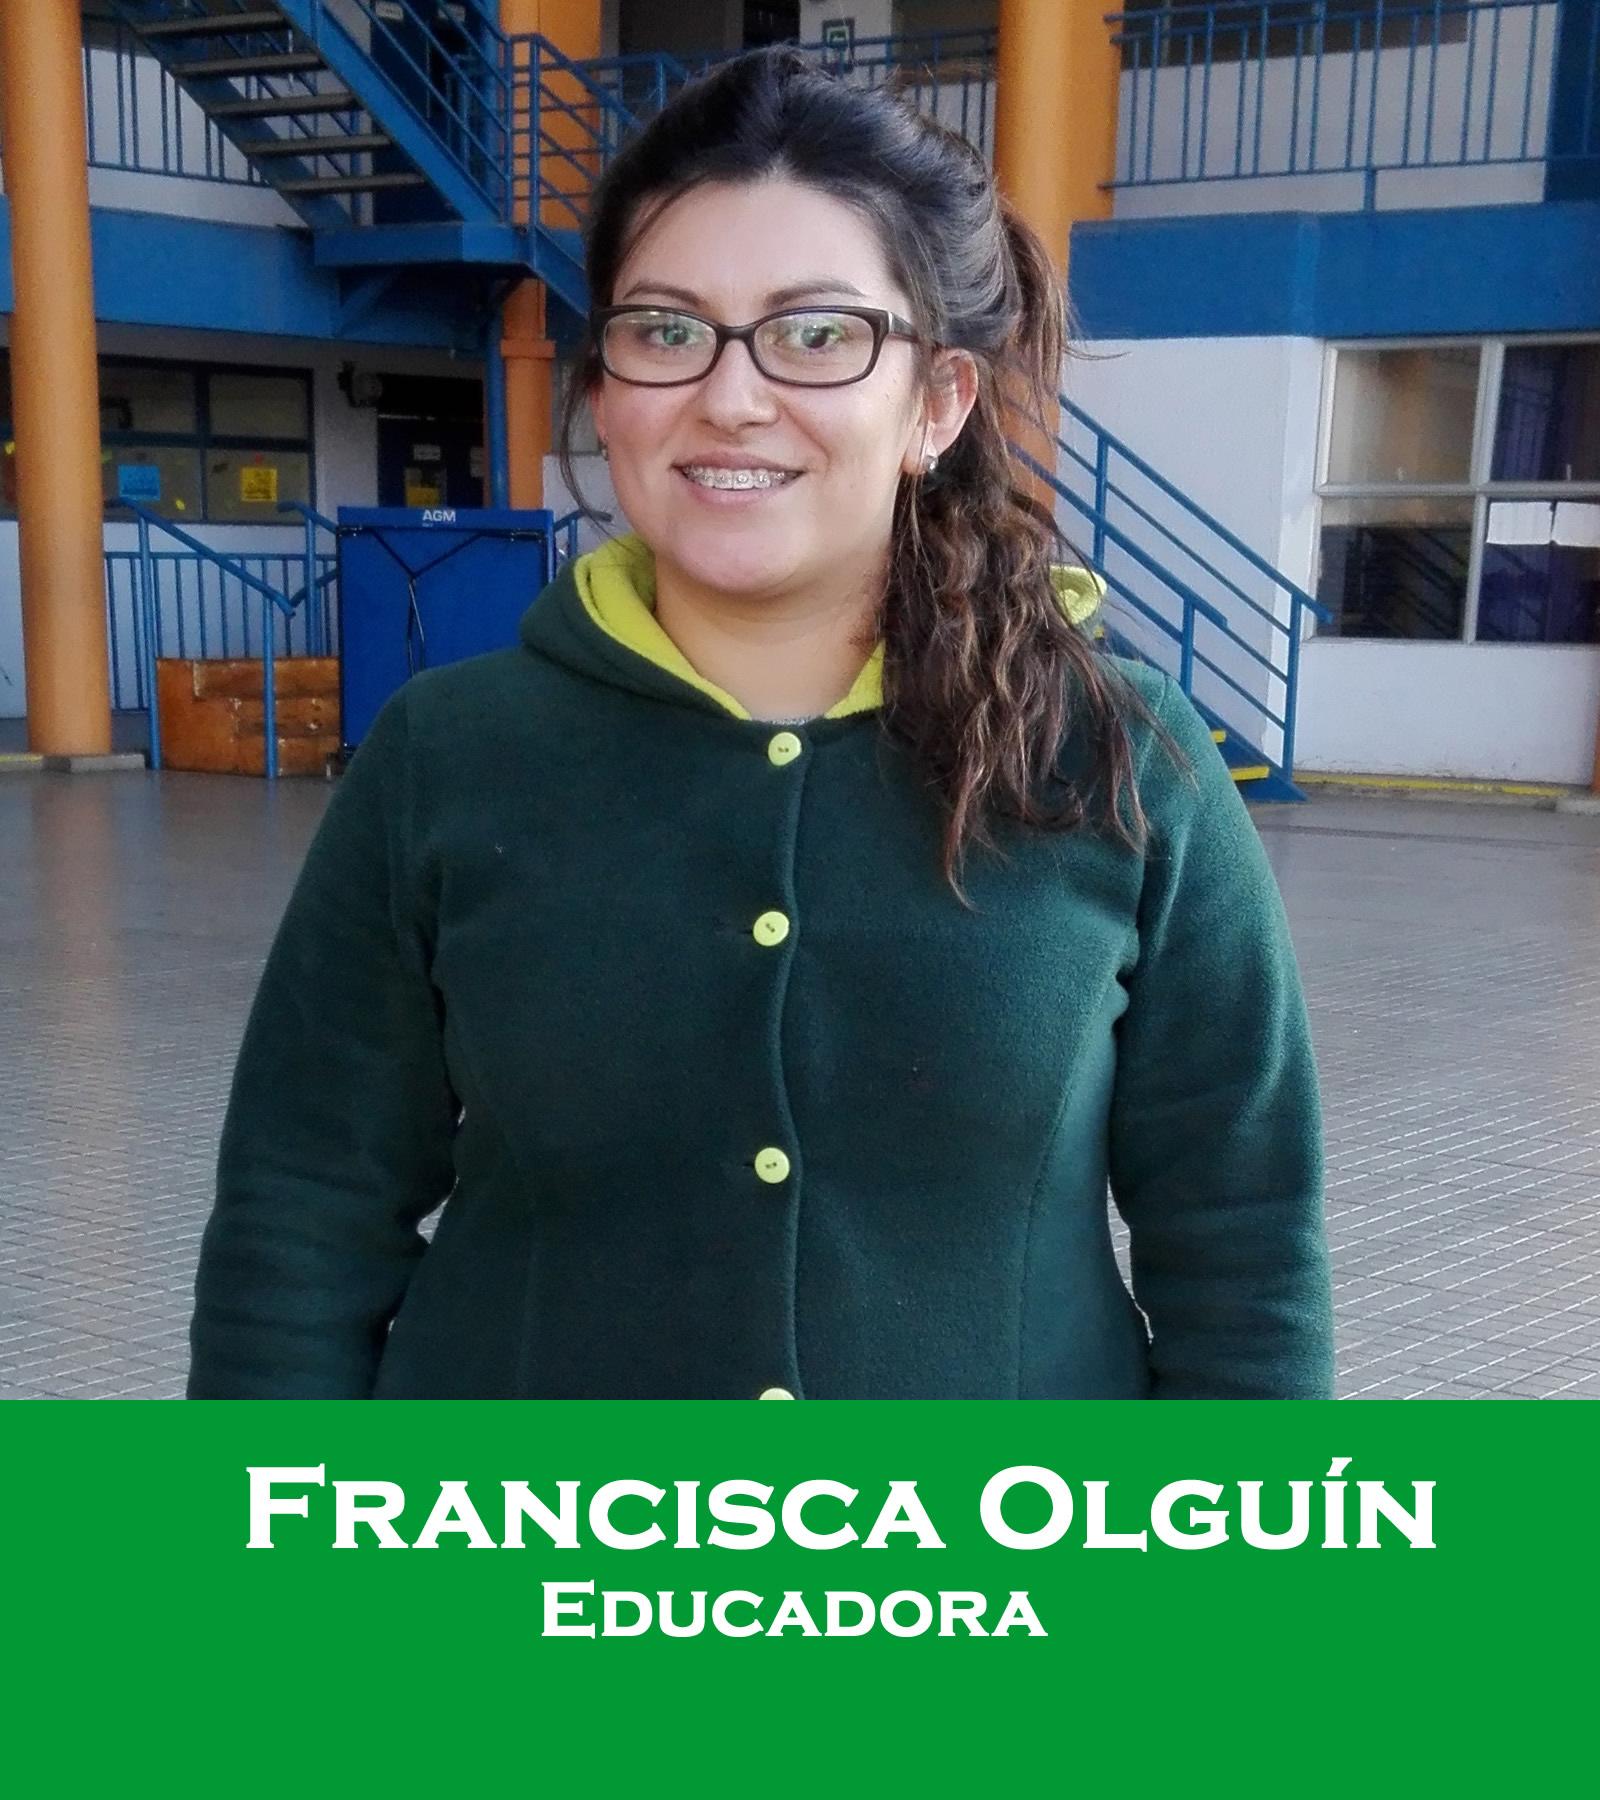 Francisca-Olguin